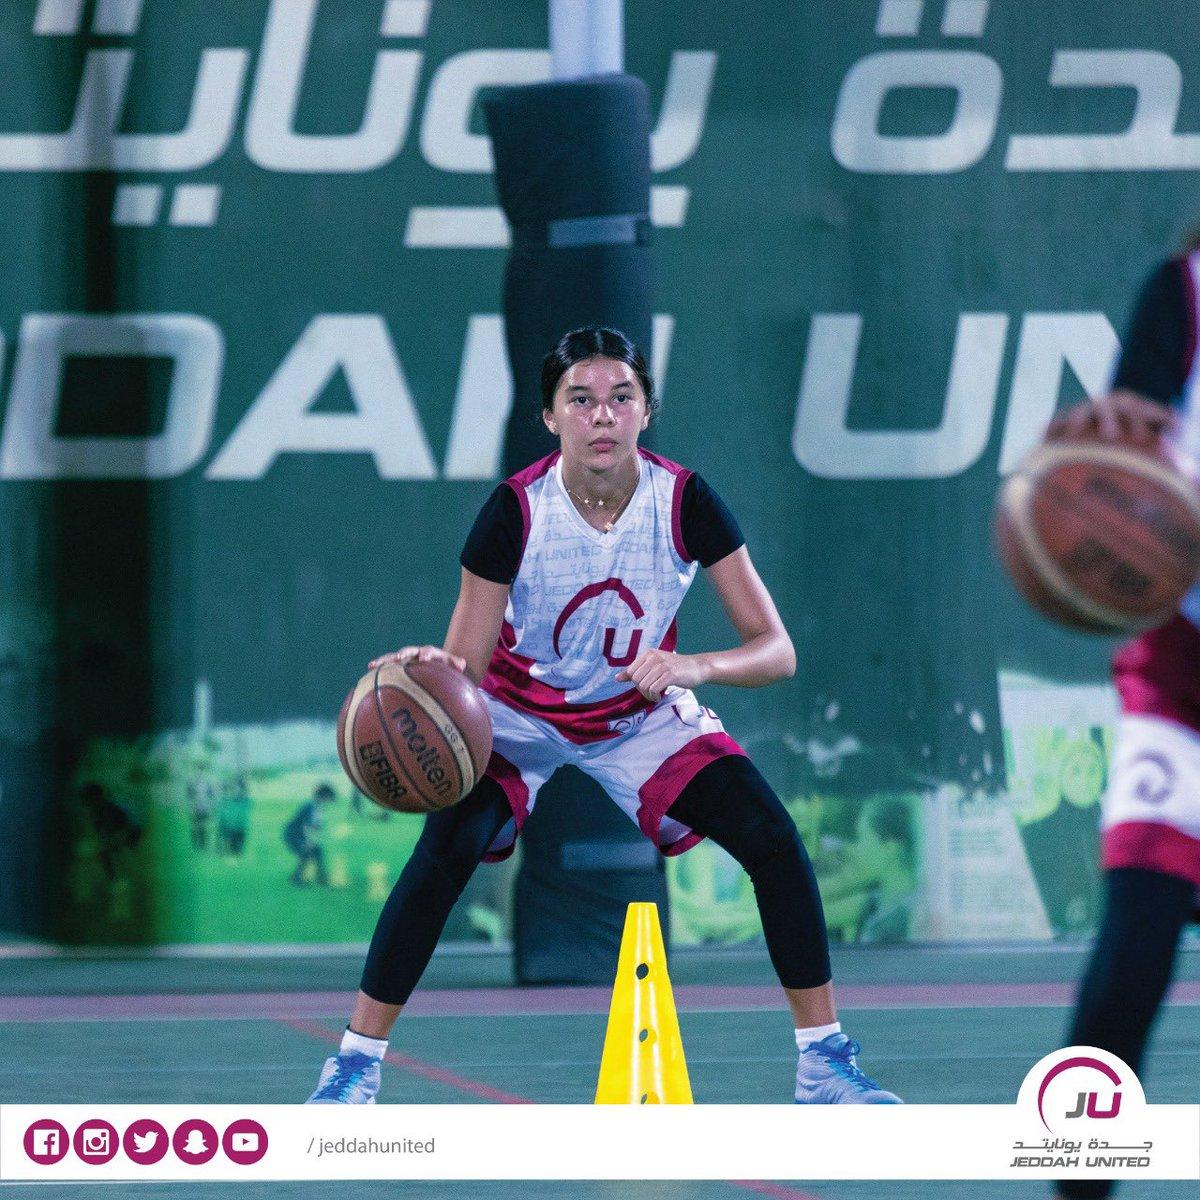 Work Hard🏀  Dream BIG 🏆 . . #JU #jeddahunited #ksa #saudiarabia #girl #football #soccer #basketball #jeddah #sport #academy #health #fit #lifestyle #passion #vision2030 #dream #جدة_يونايتد #جدة #كرة_القدم #السعودية #طموح #رياضة #صحة #أكاديمية #حلم #بنات